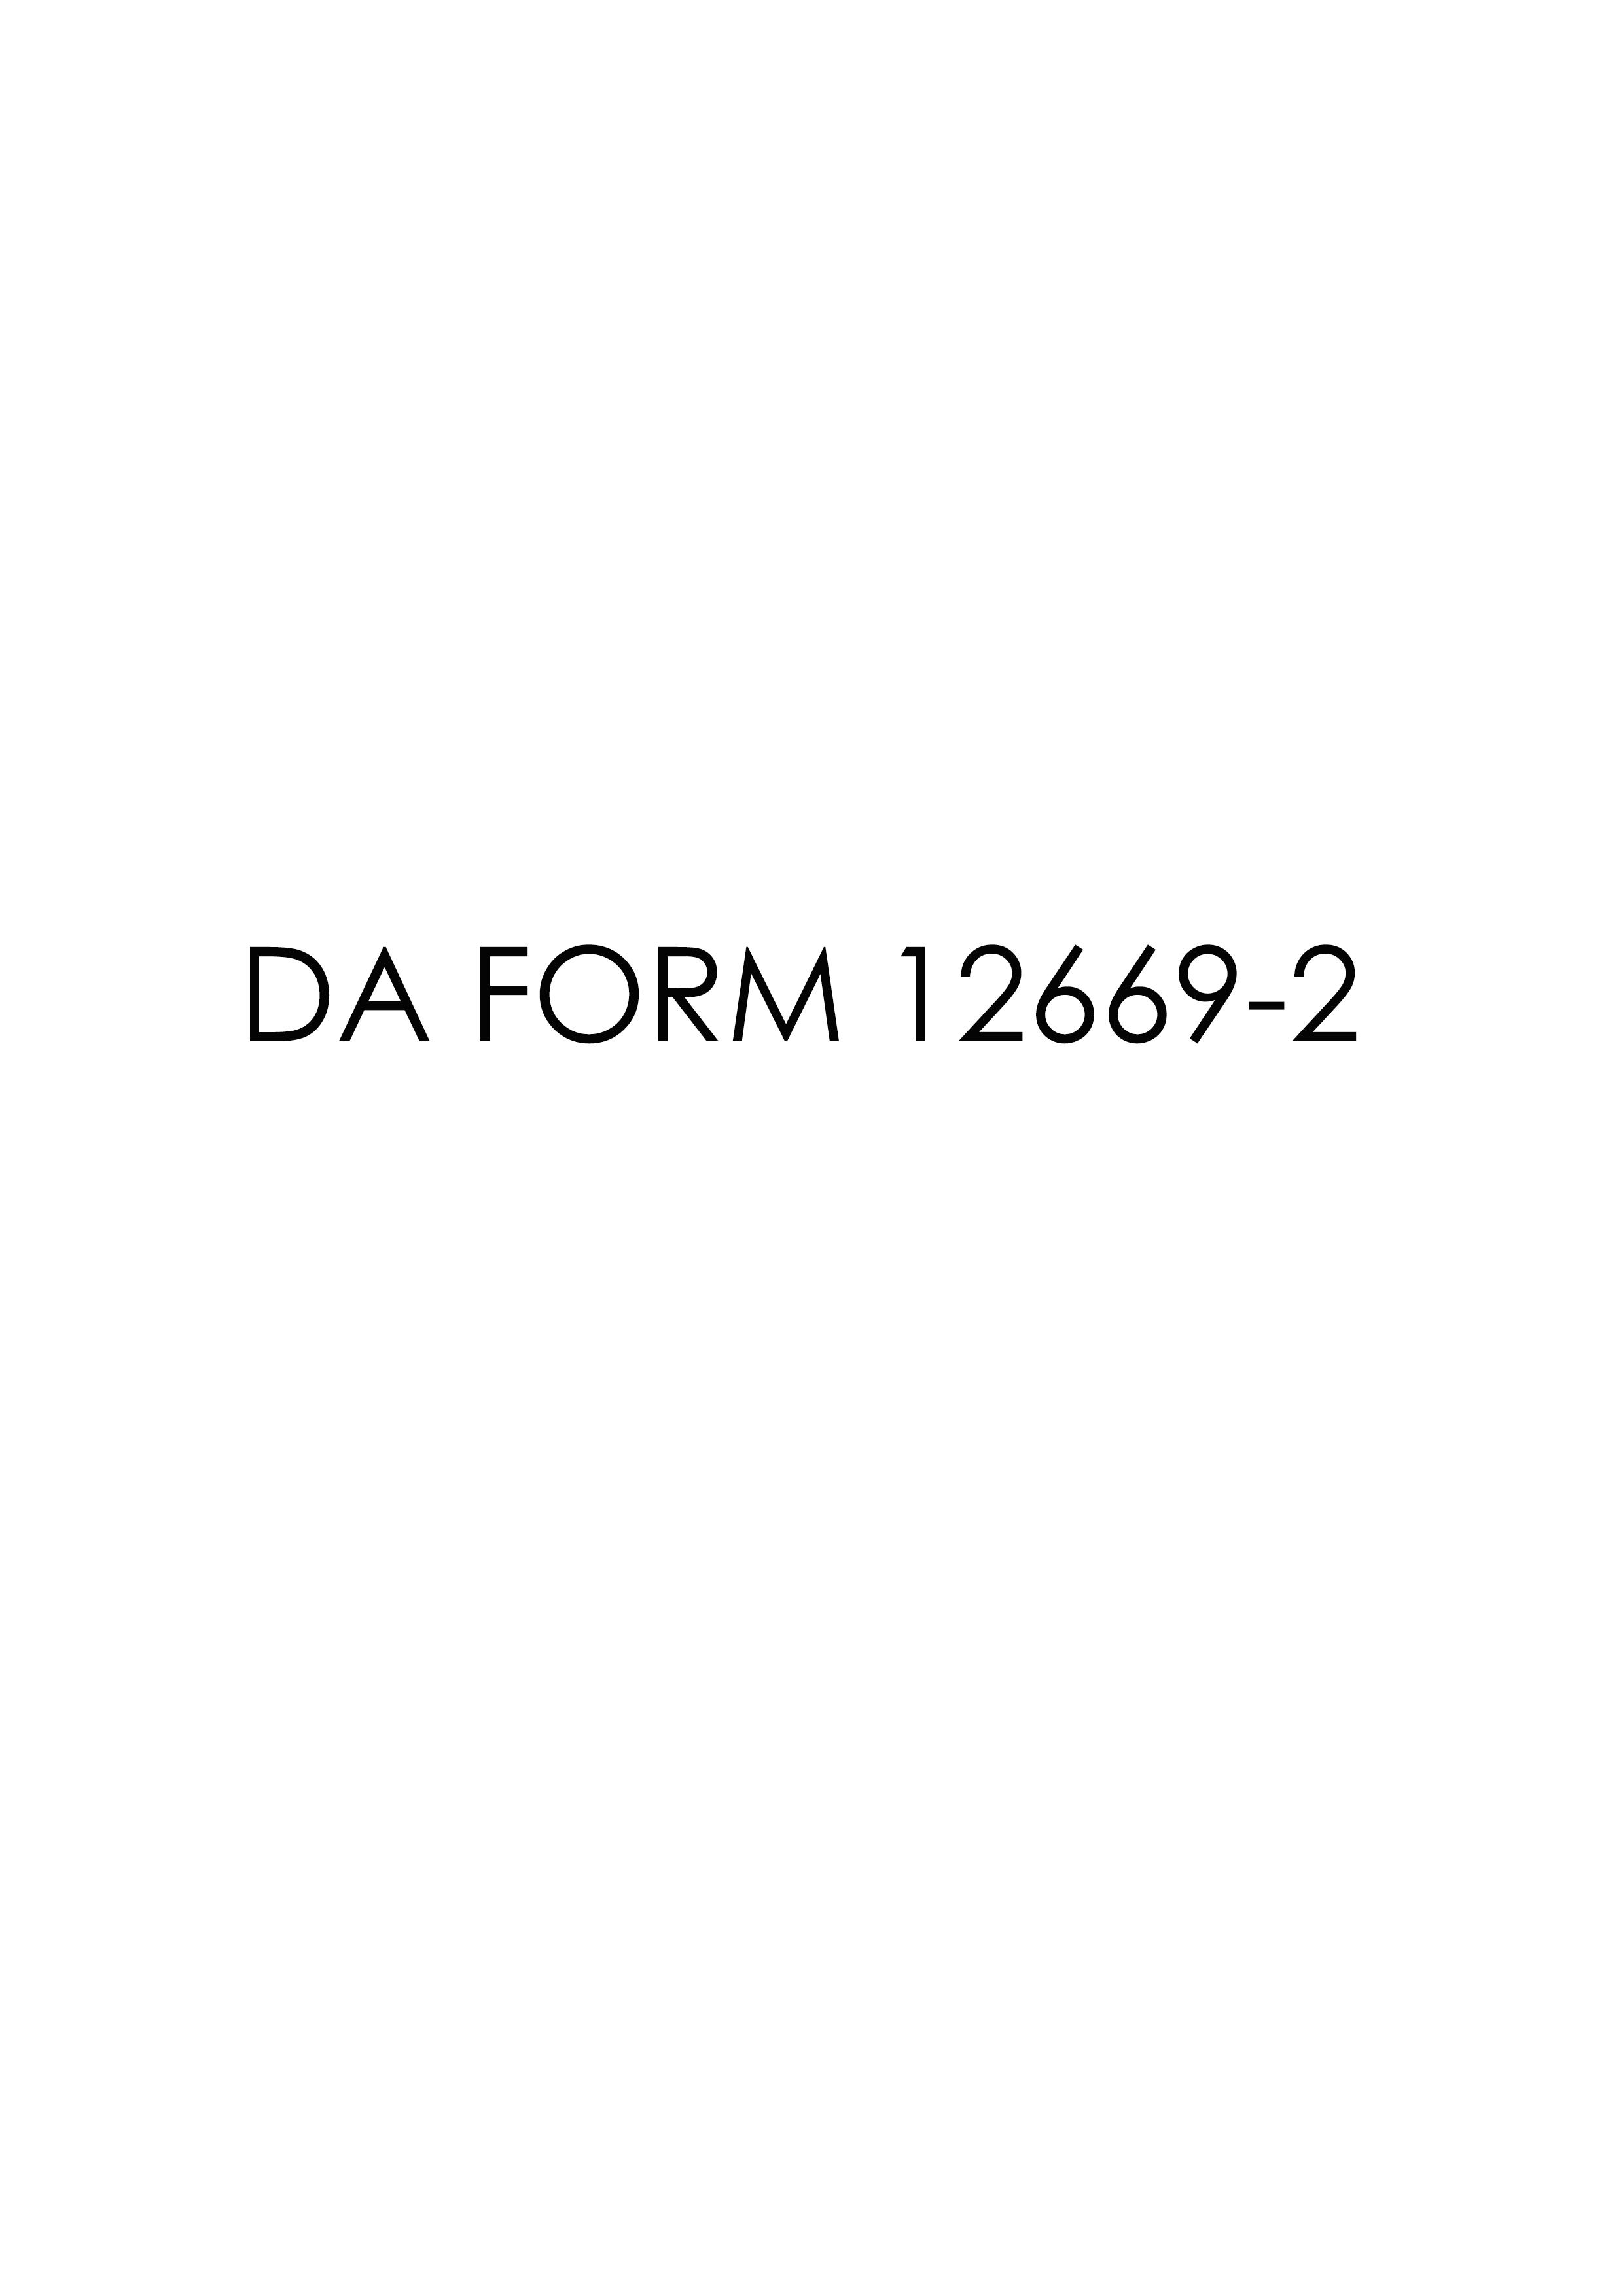 Download Fillable da Form 12669-2